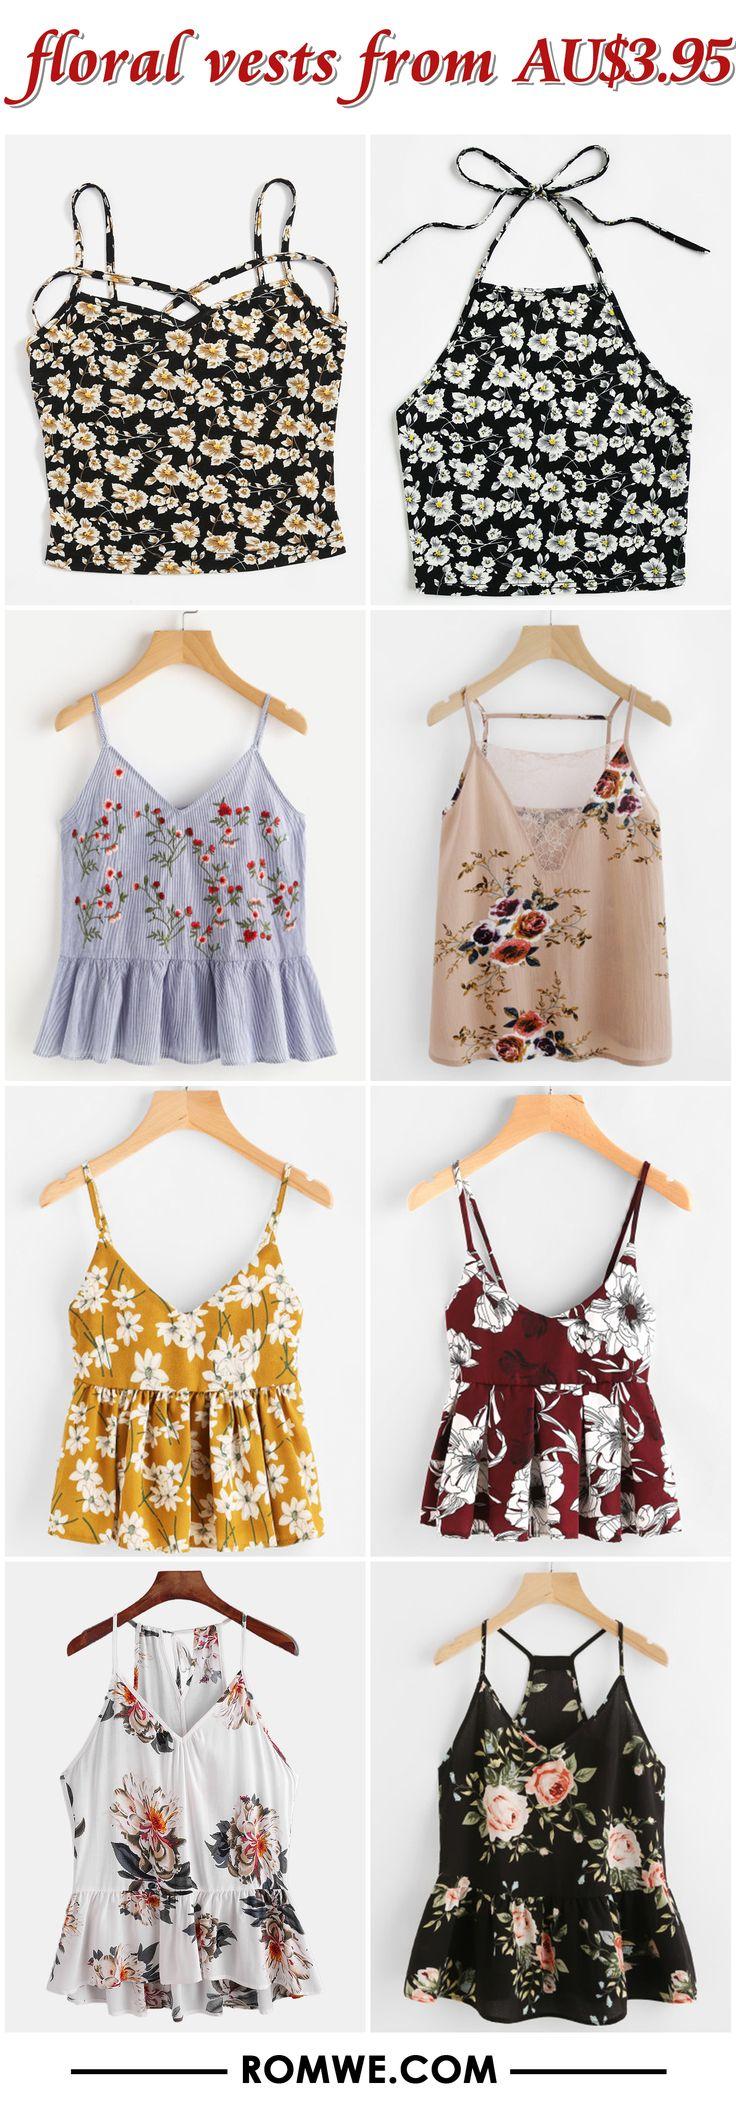 floral vests from AU$3.95